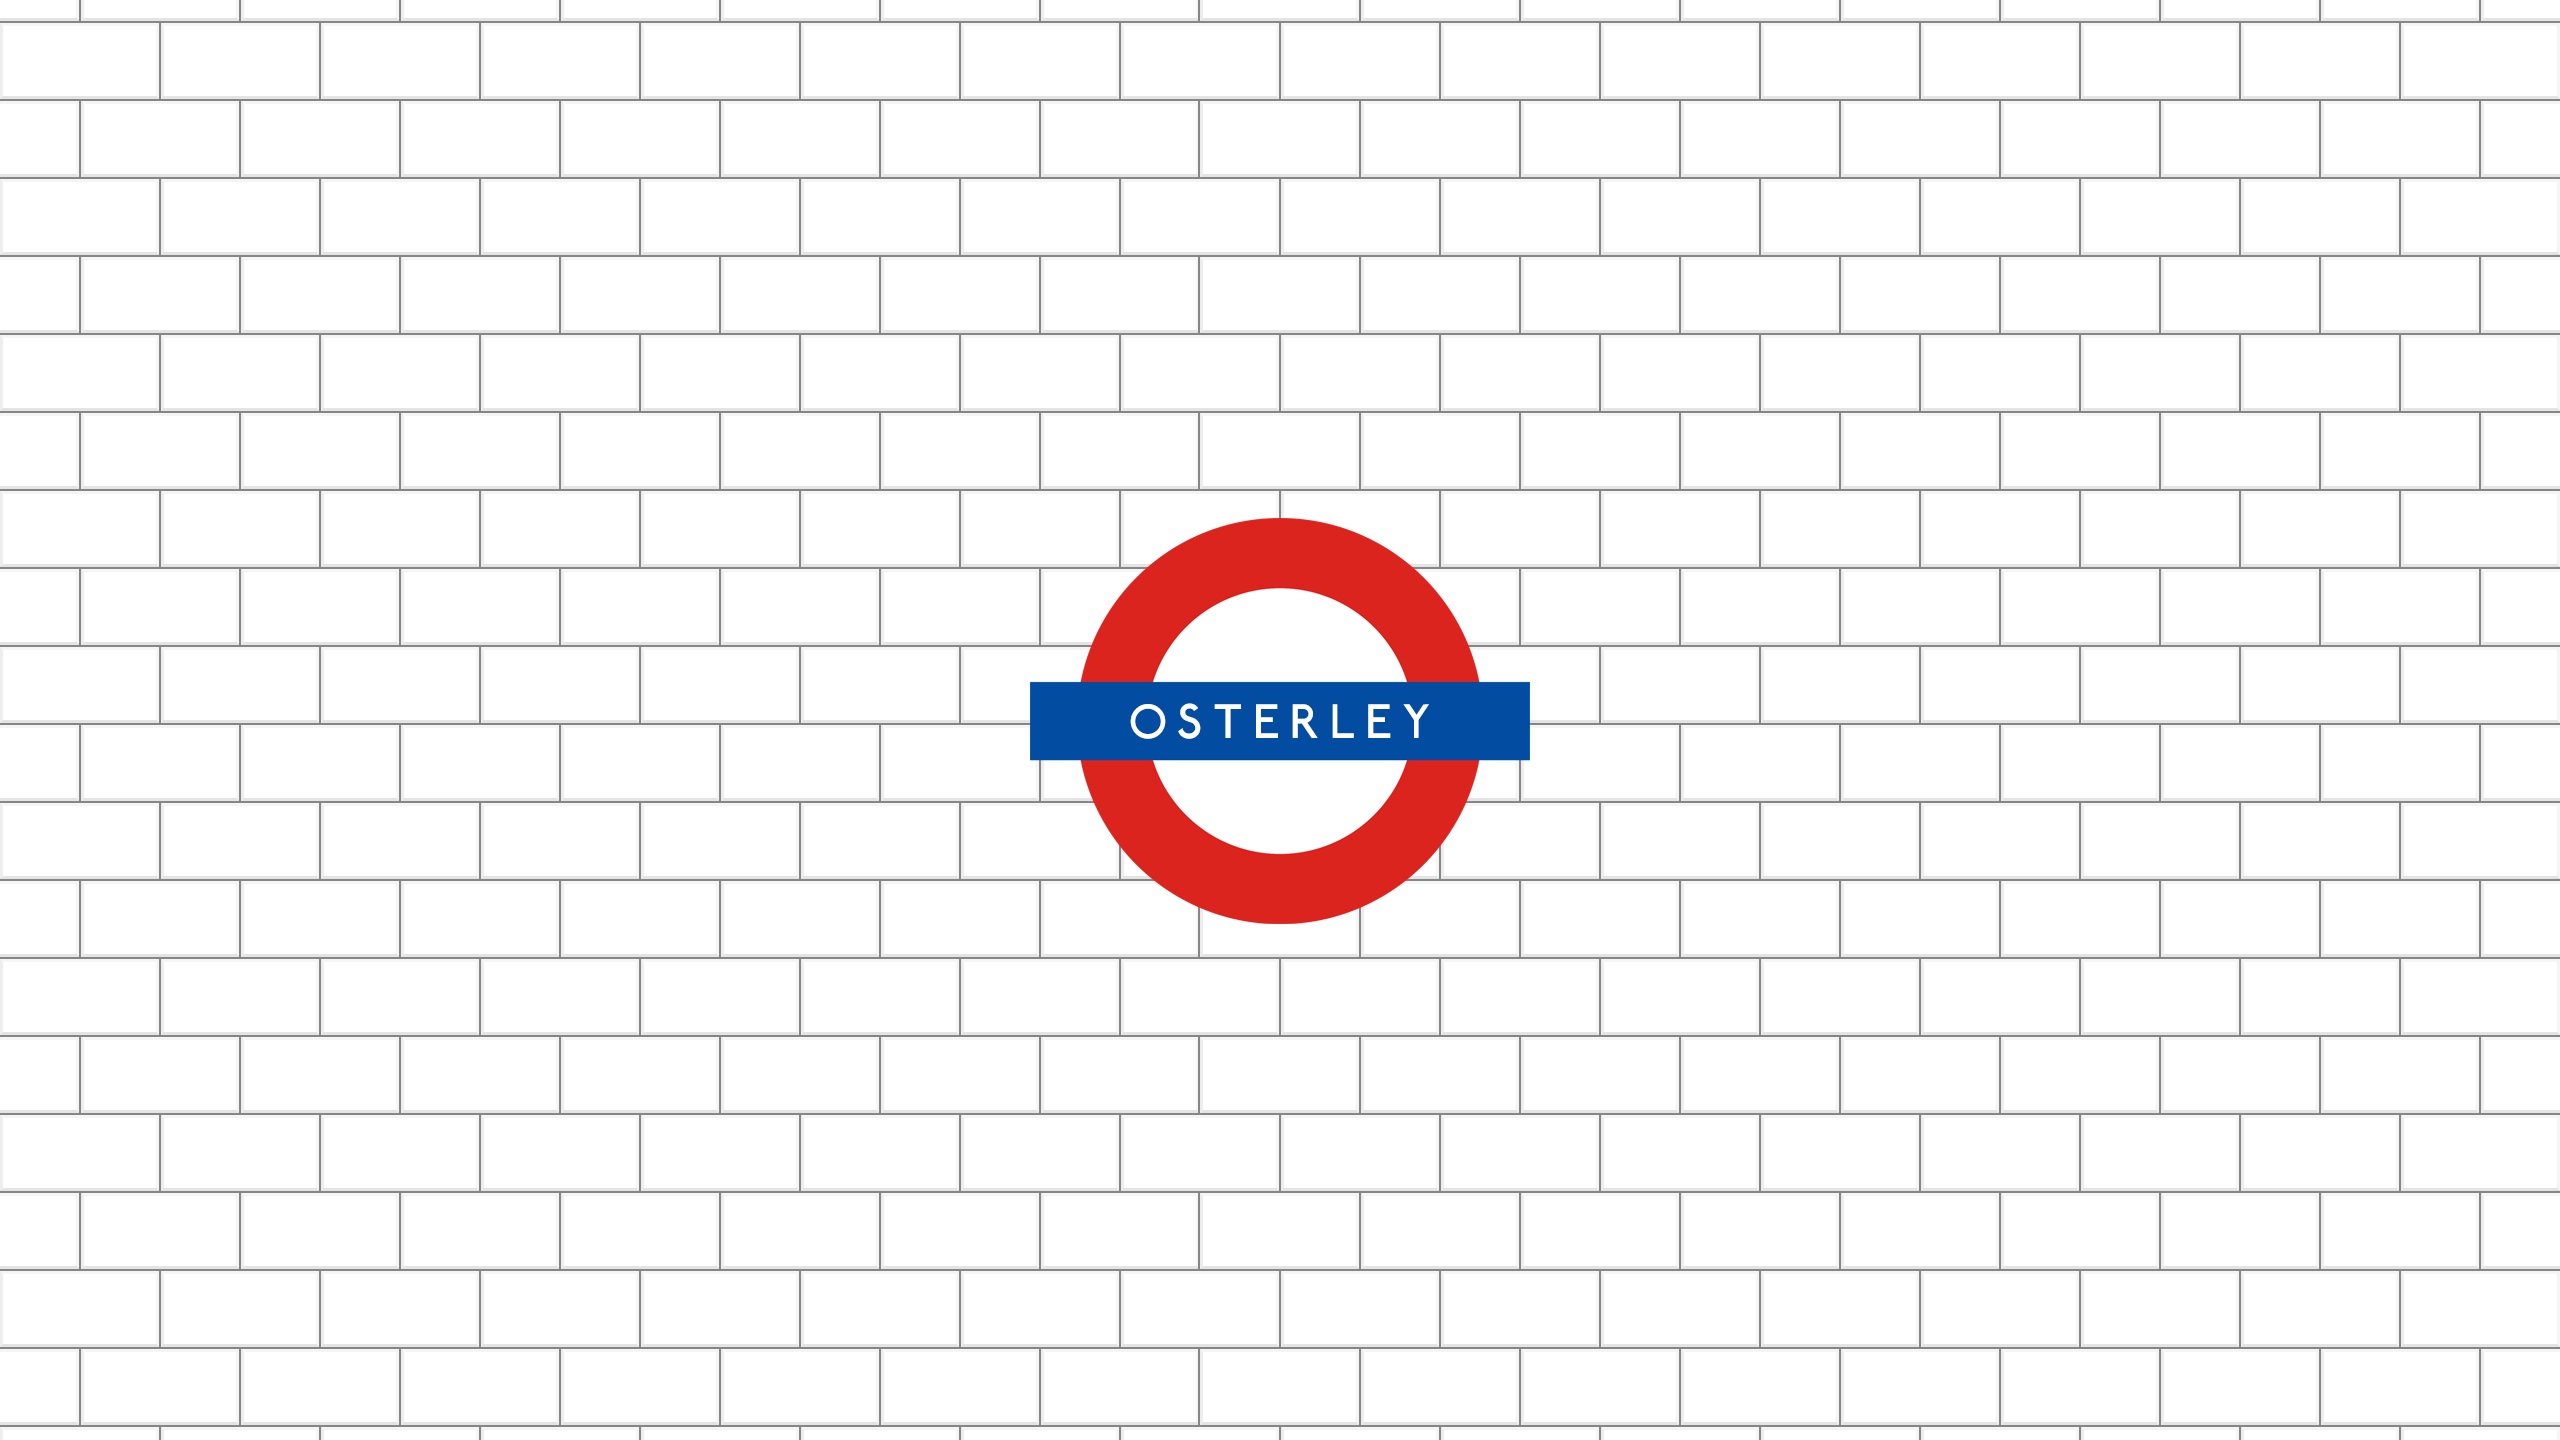 Osterley